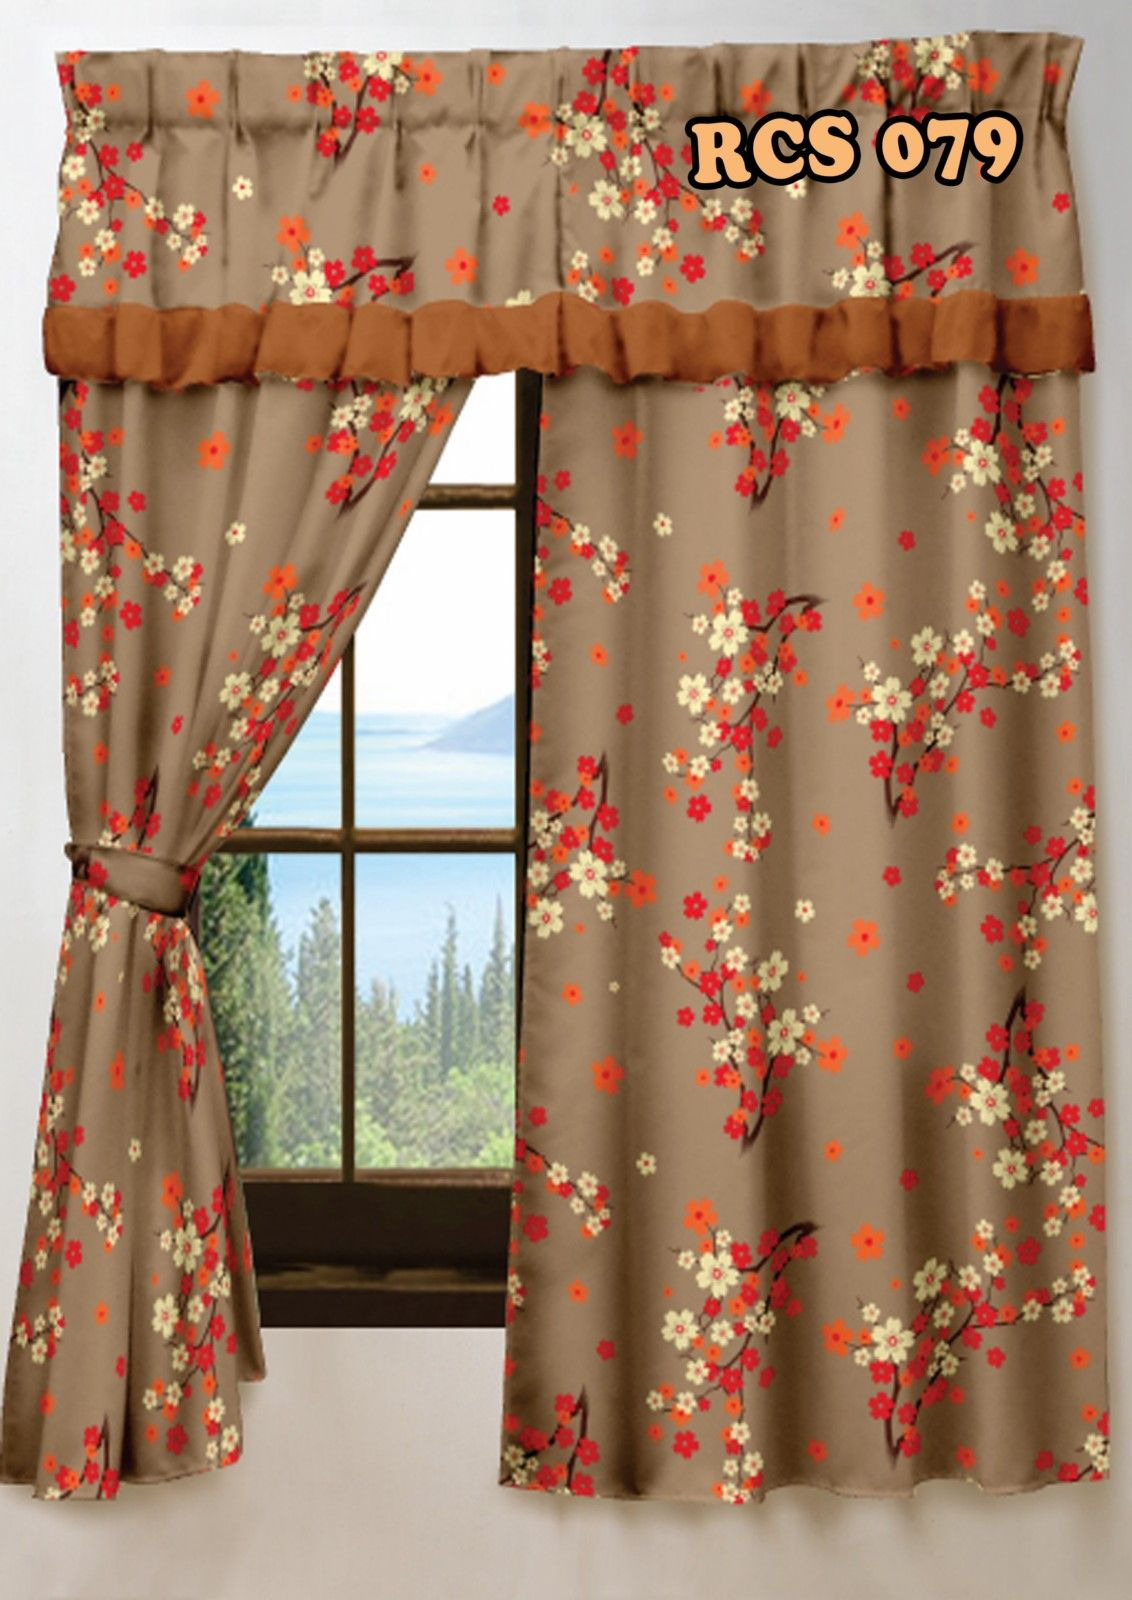 Azza Izzura Enterprise Langsir Tingkap Pilihan Ramai Harga Murah Diy Fashion Home Decor Langsir living room concept